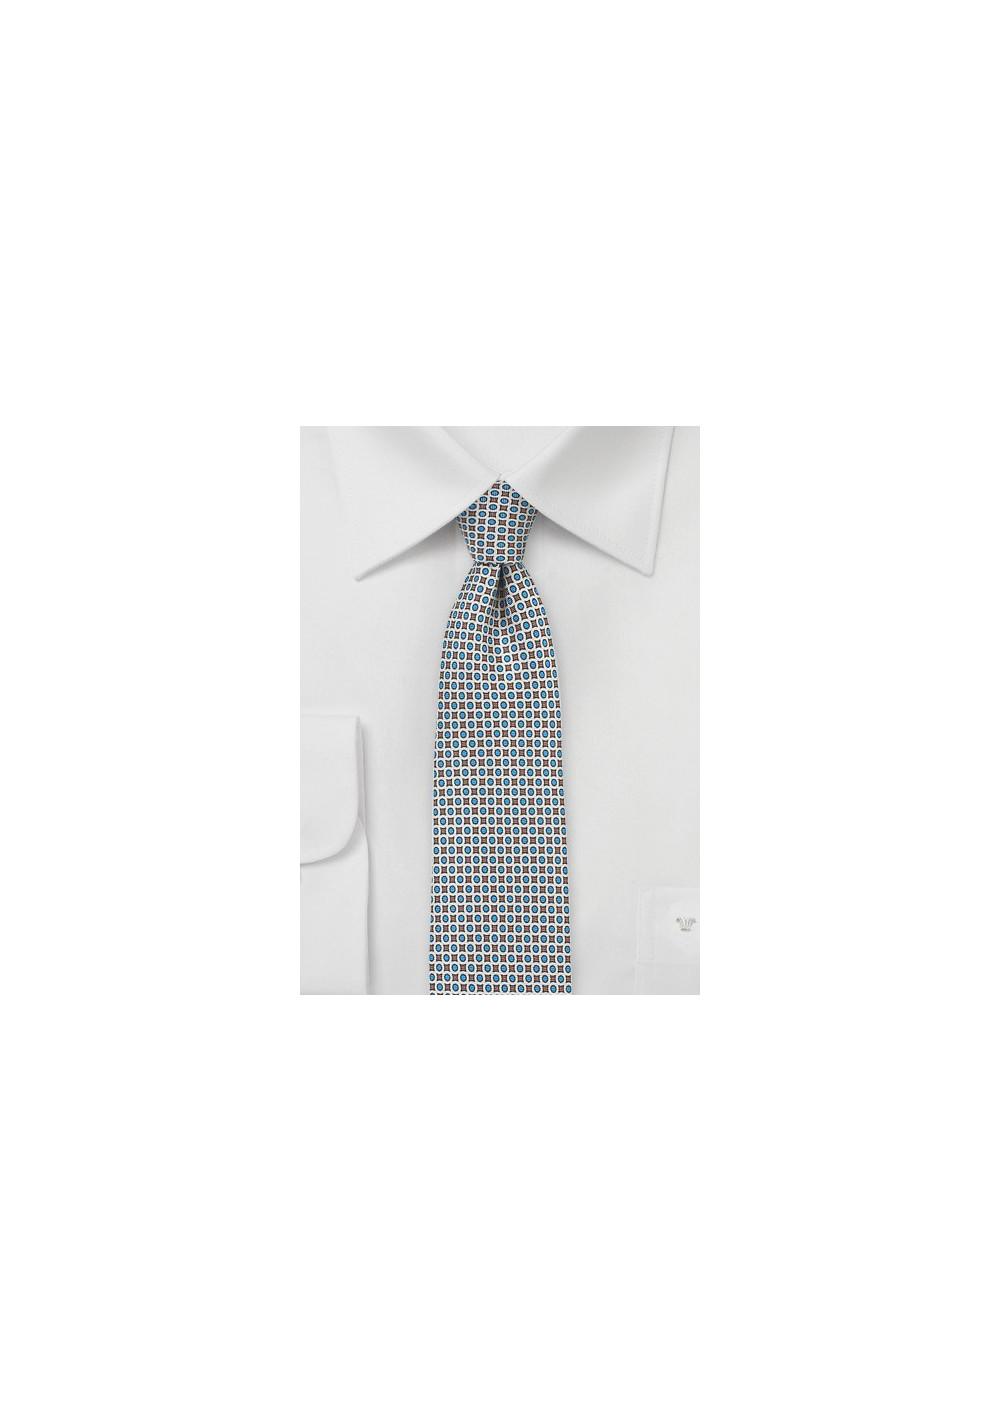 Geometric Print Skinny Tie in Light Blue and Gray